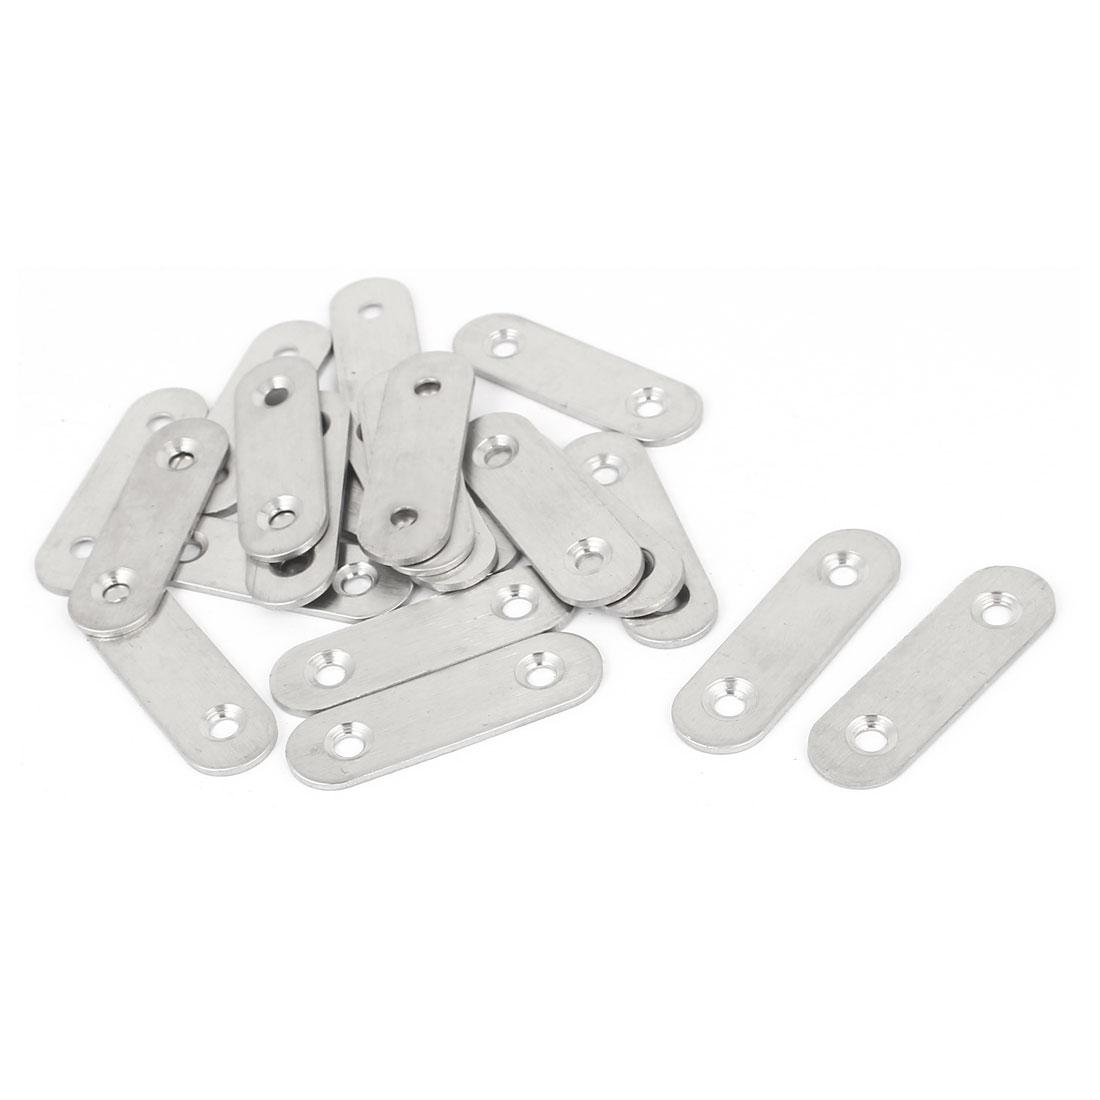 50mm x 15mm x 2mm Straight Corner Brace Bracket Flat Mending Repair Plate 20PCS